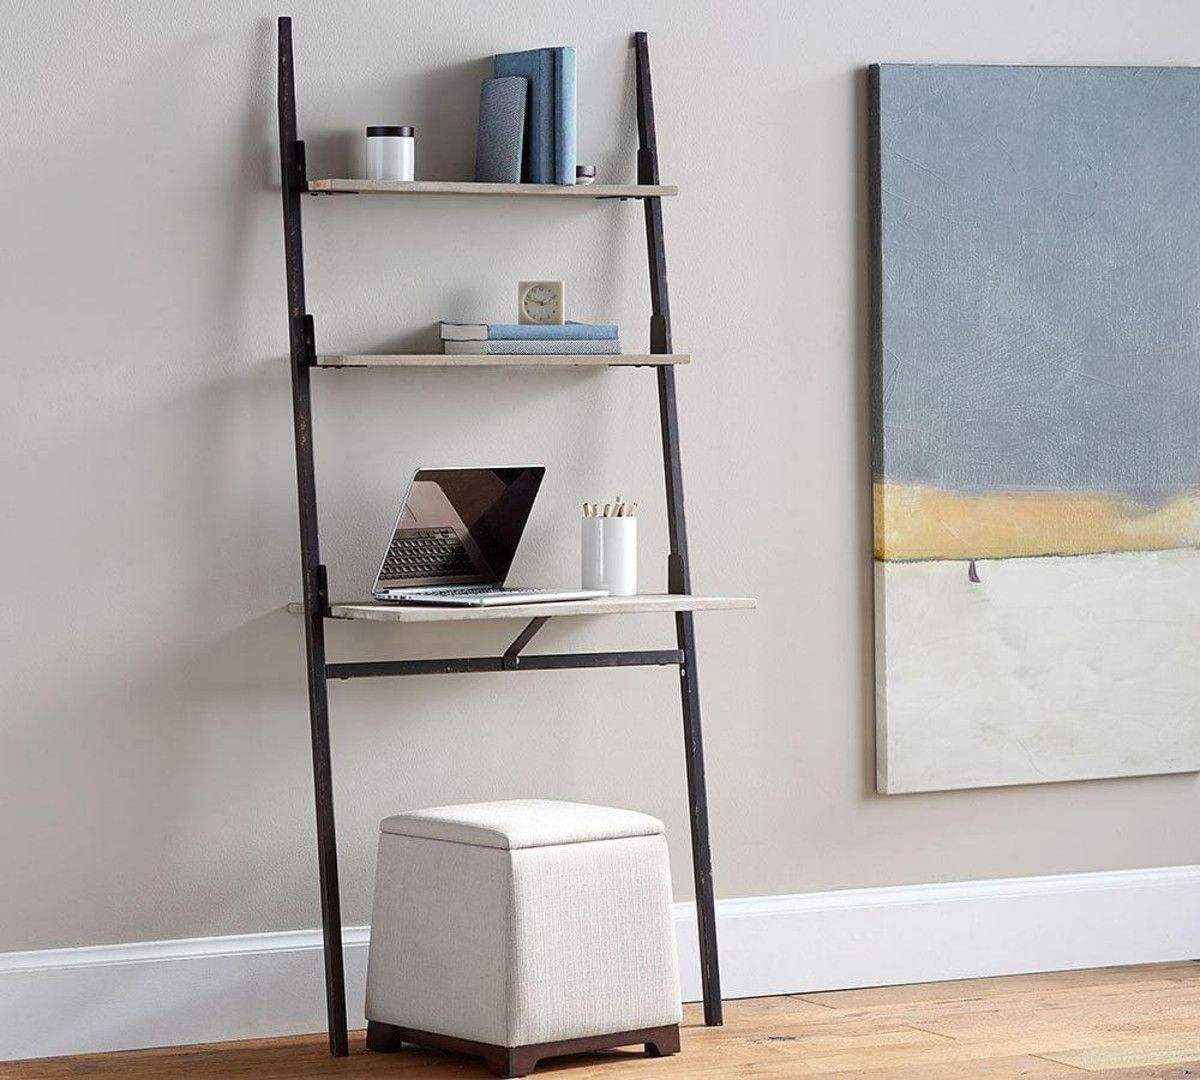 Clarkson Ladder Desk | Office Space | Pinterest | Desks, Office ...